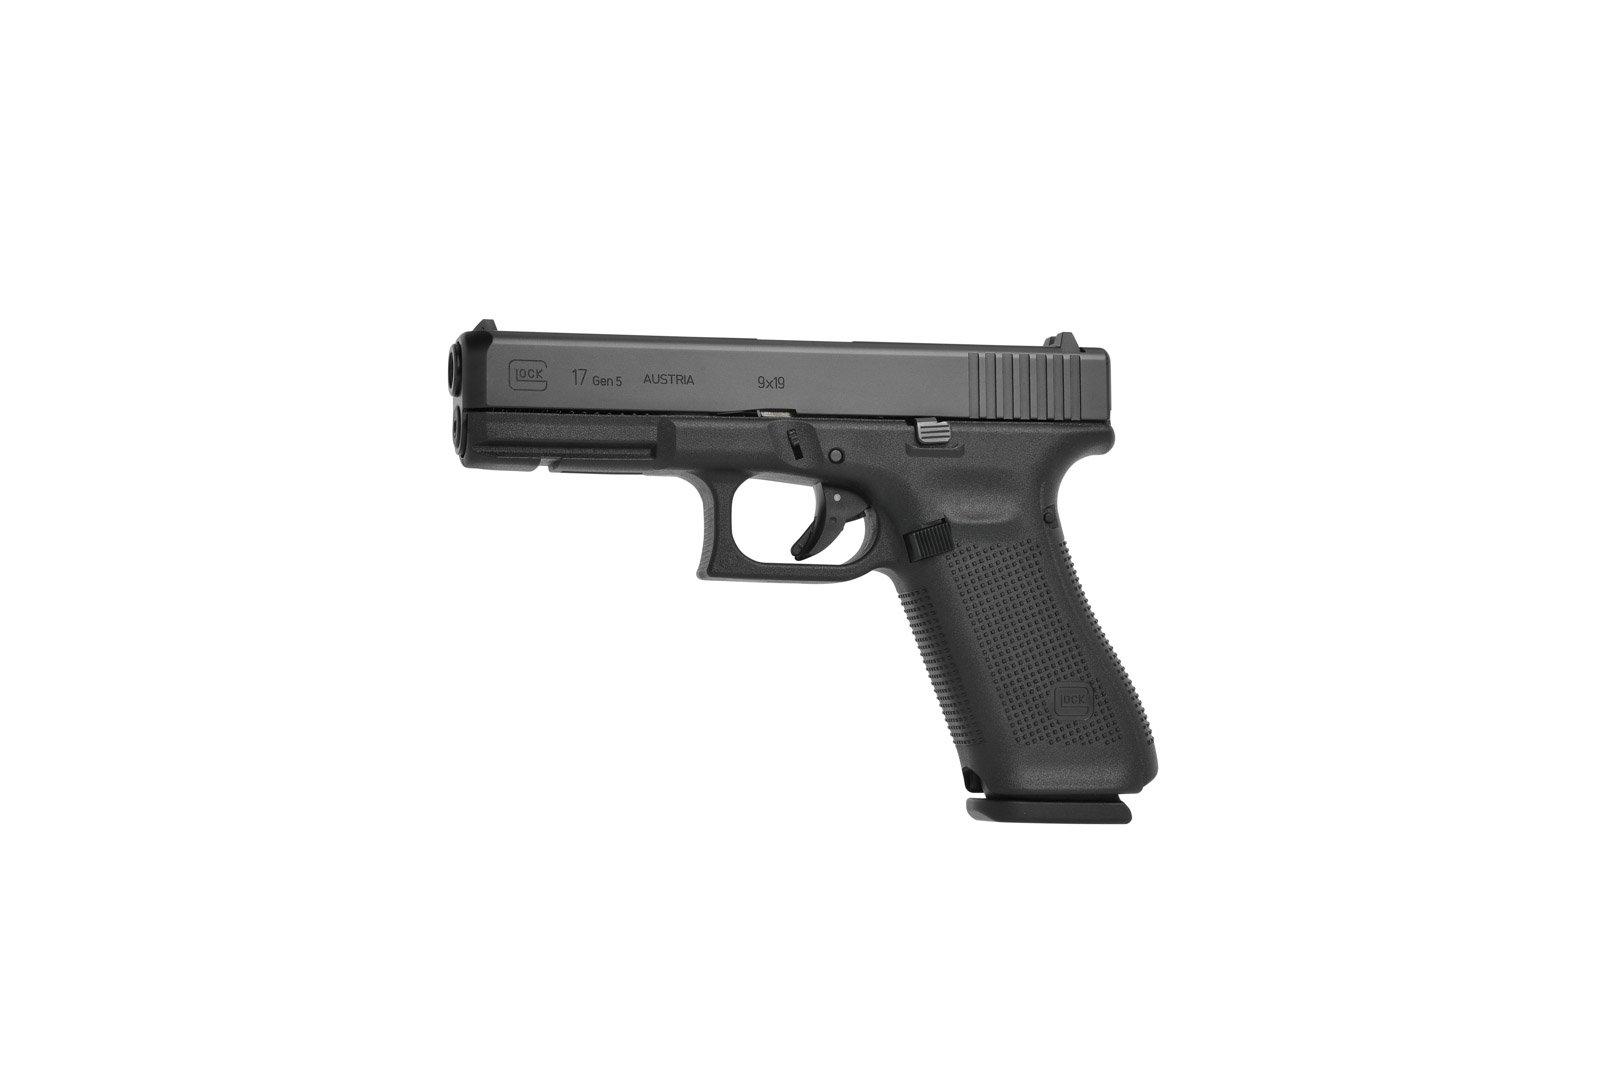 Glock 17 Gen 5 - 9mm (Fixed Sights)